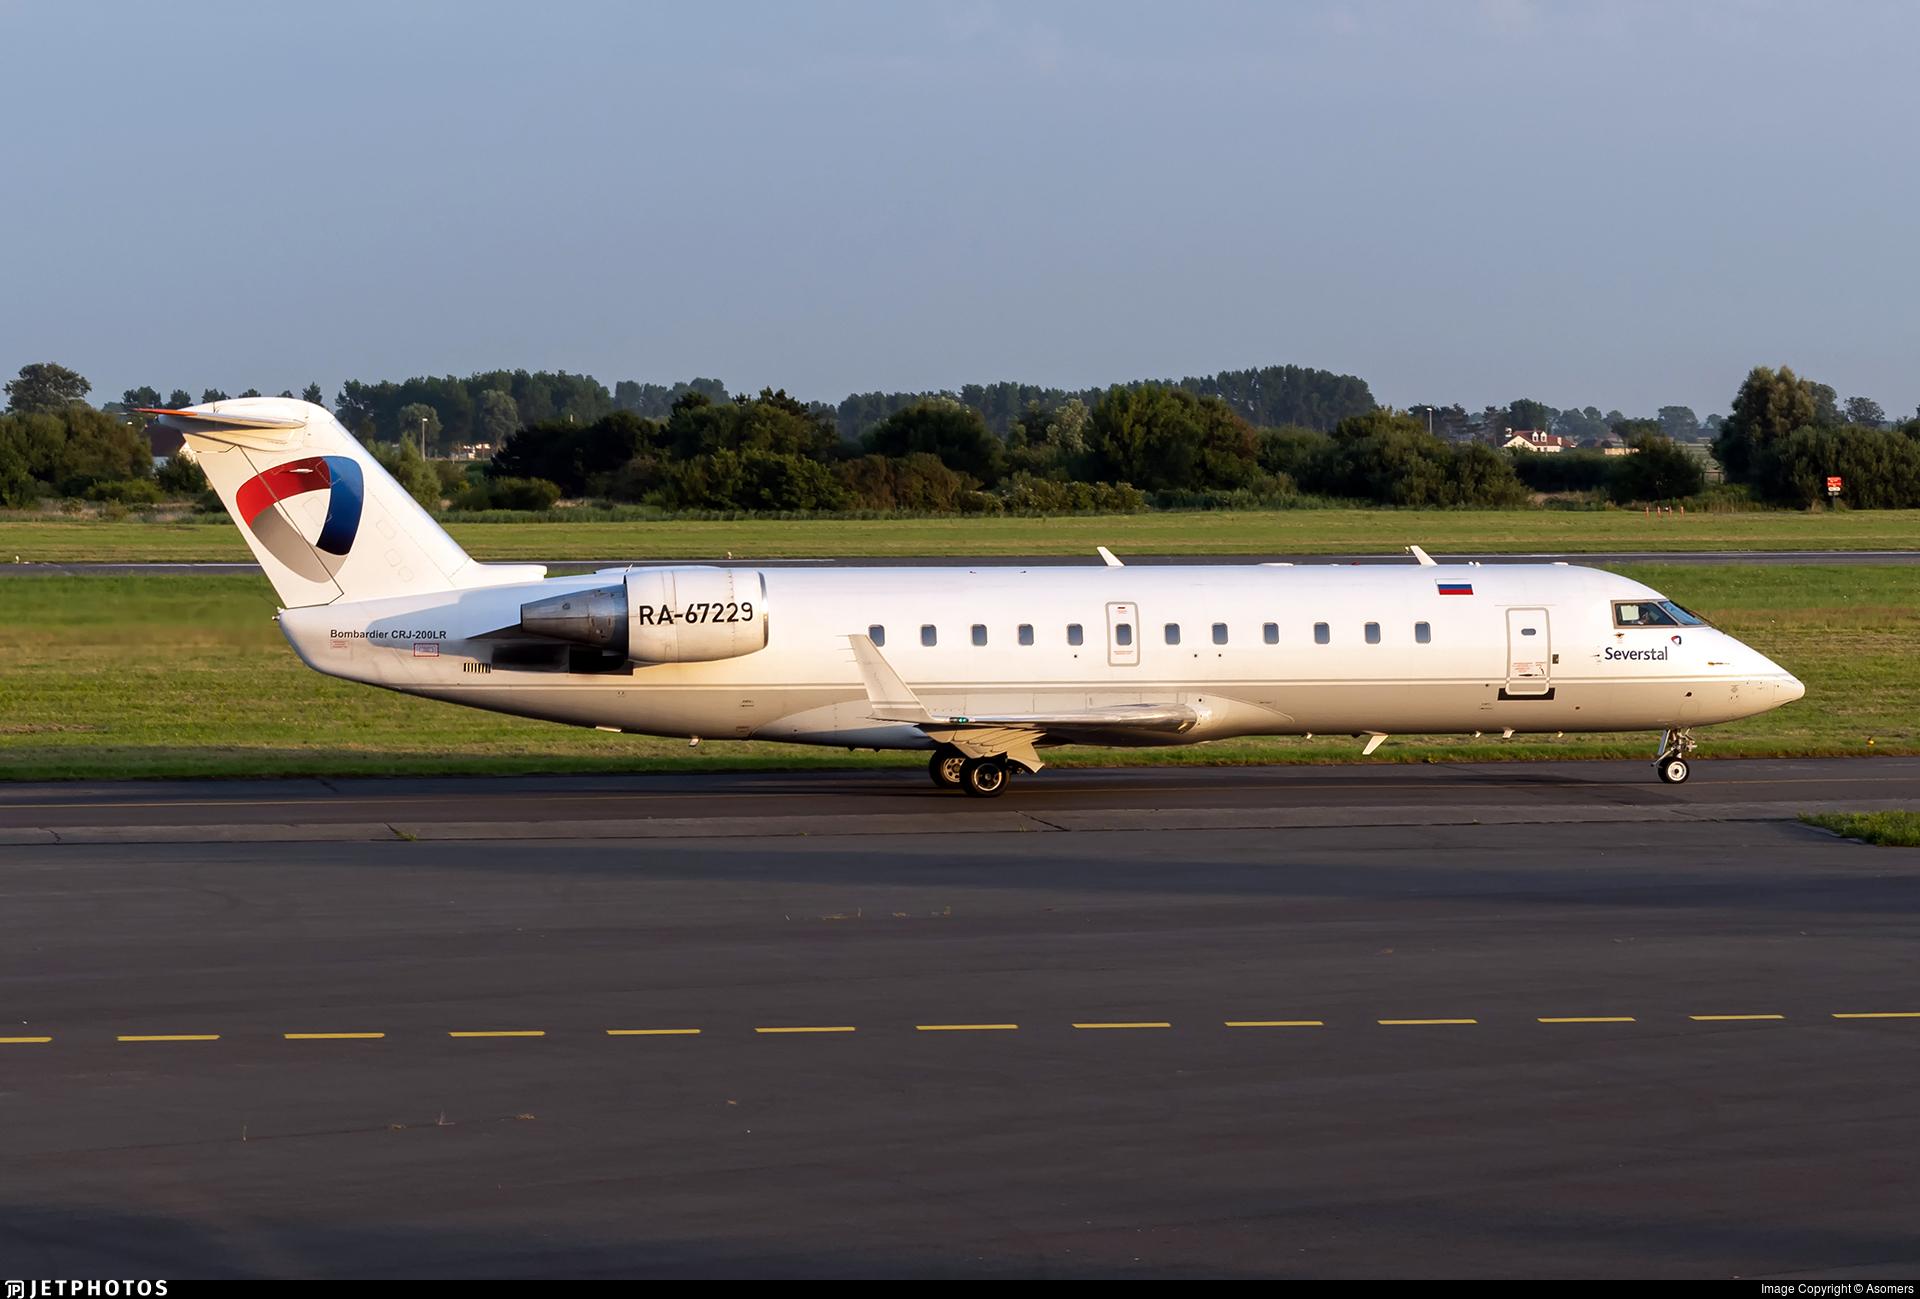 RA-67229 - Bombardier CRJ-200LR - Severstal Air Company